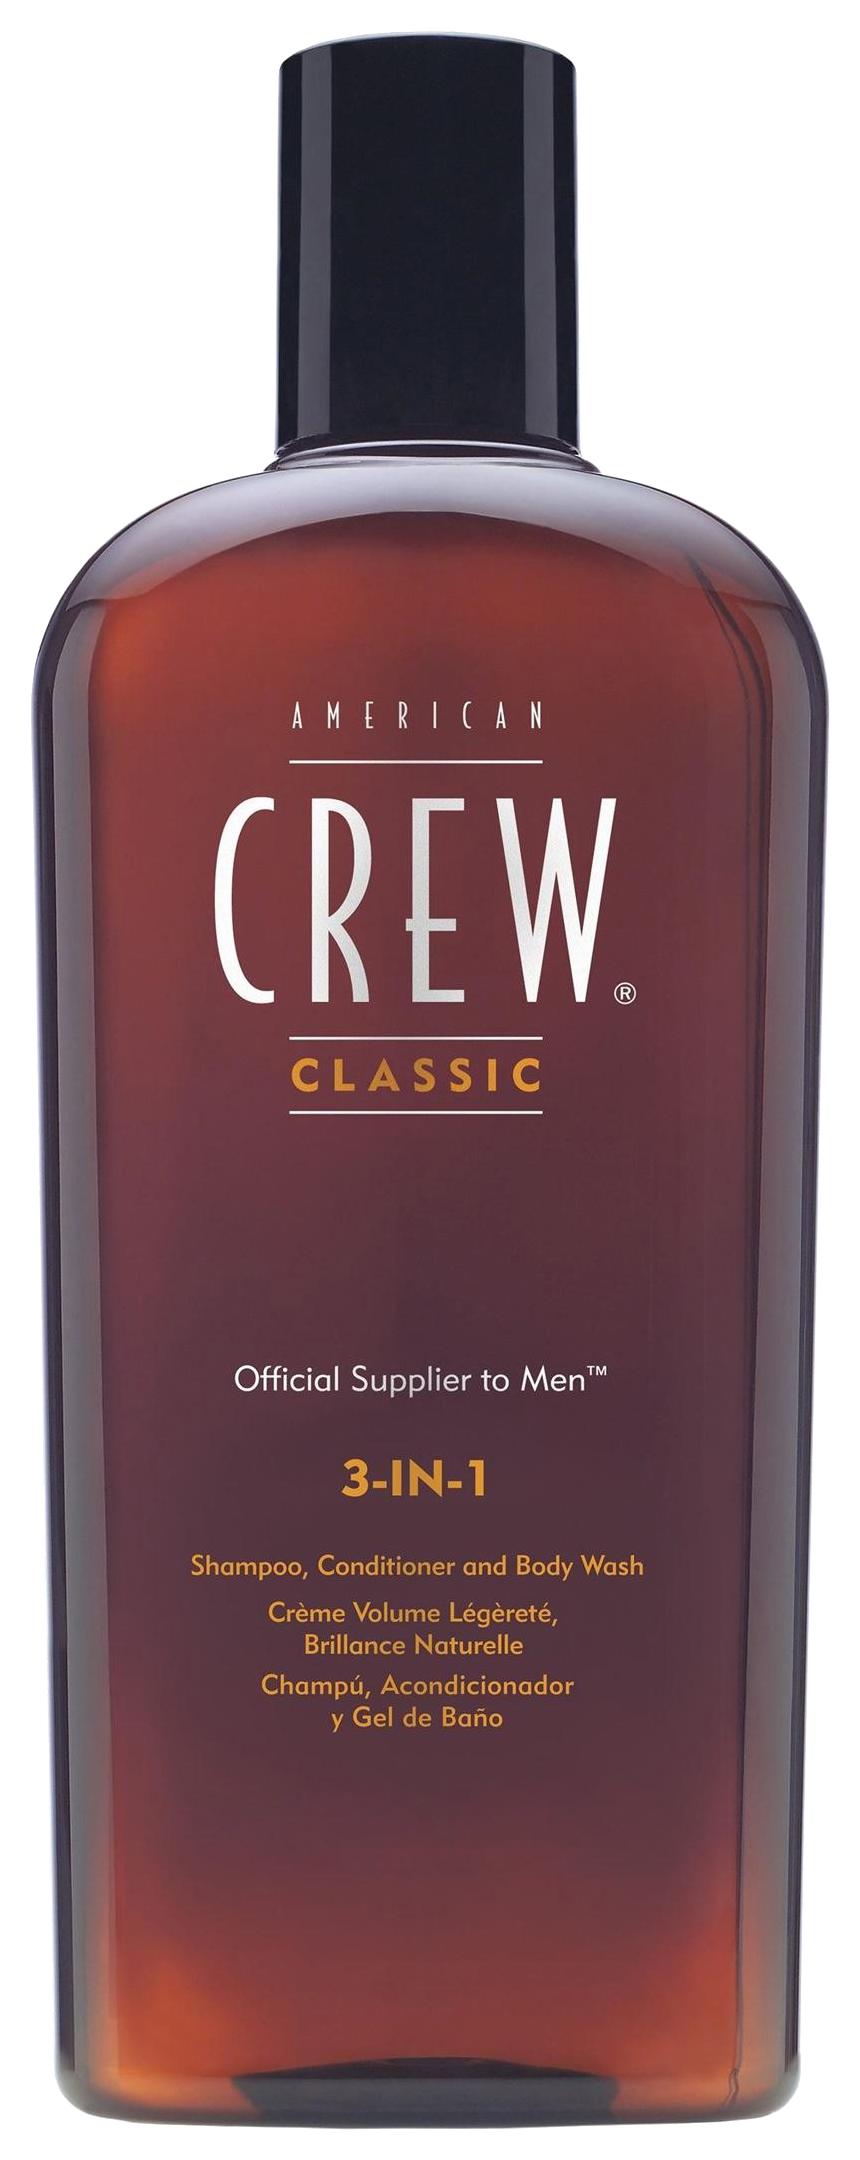 AMERICAN CREW 3-IN-1